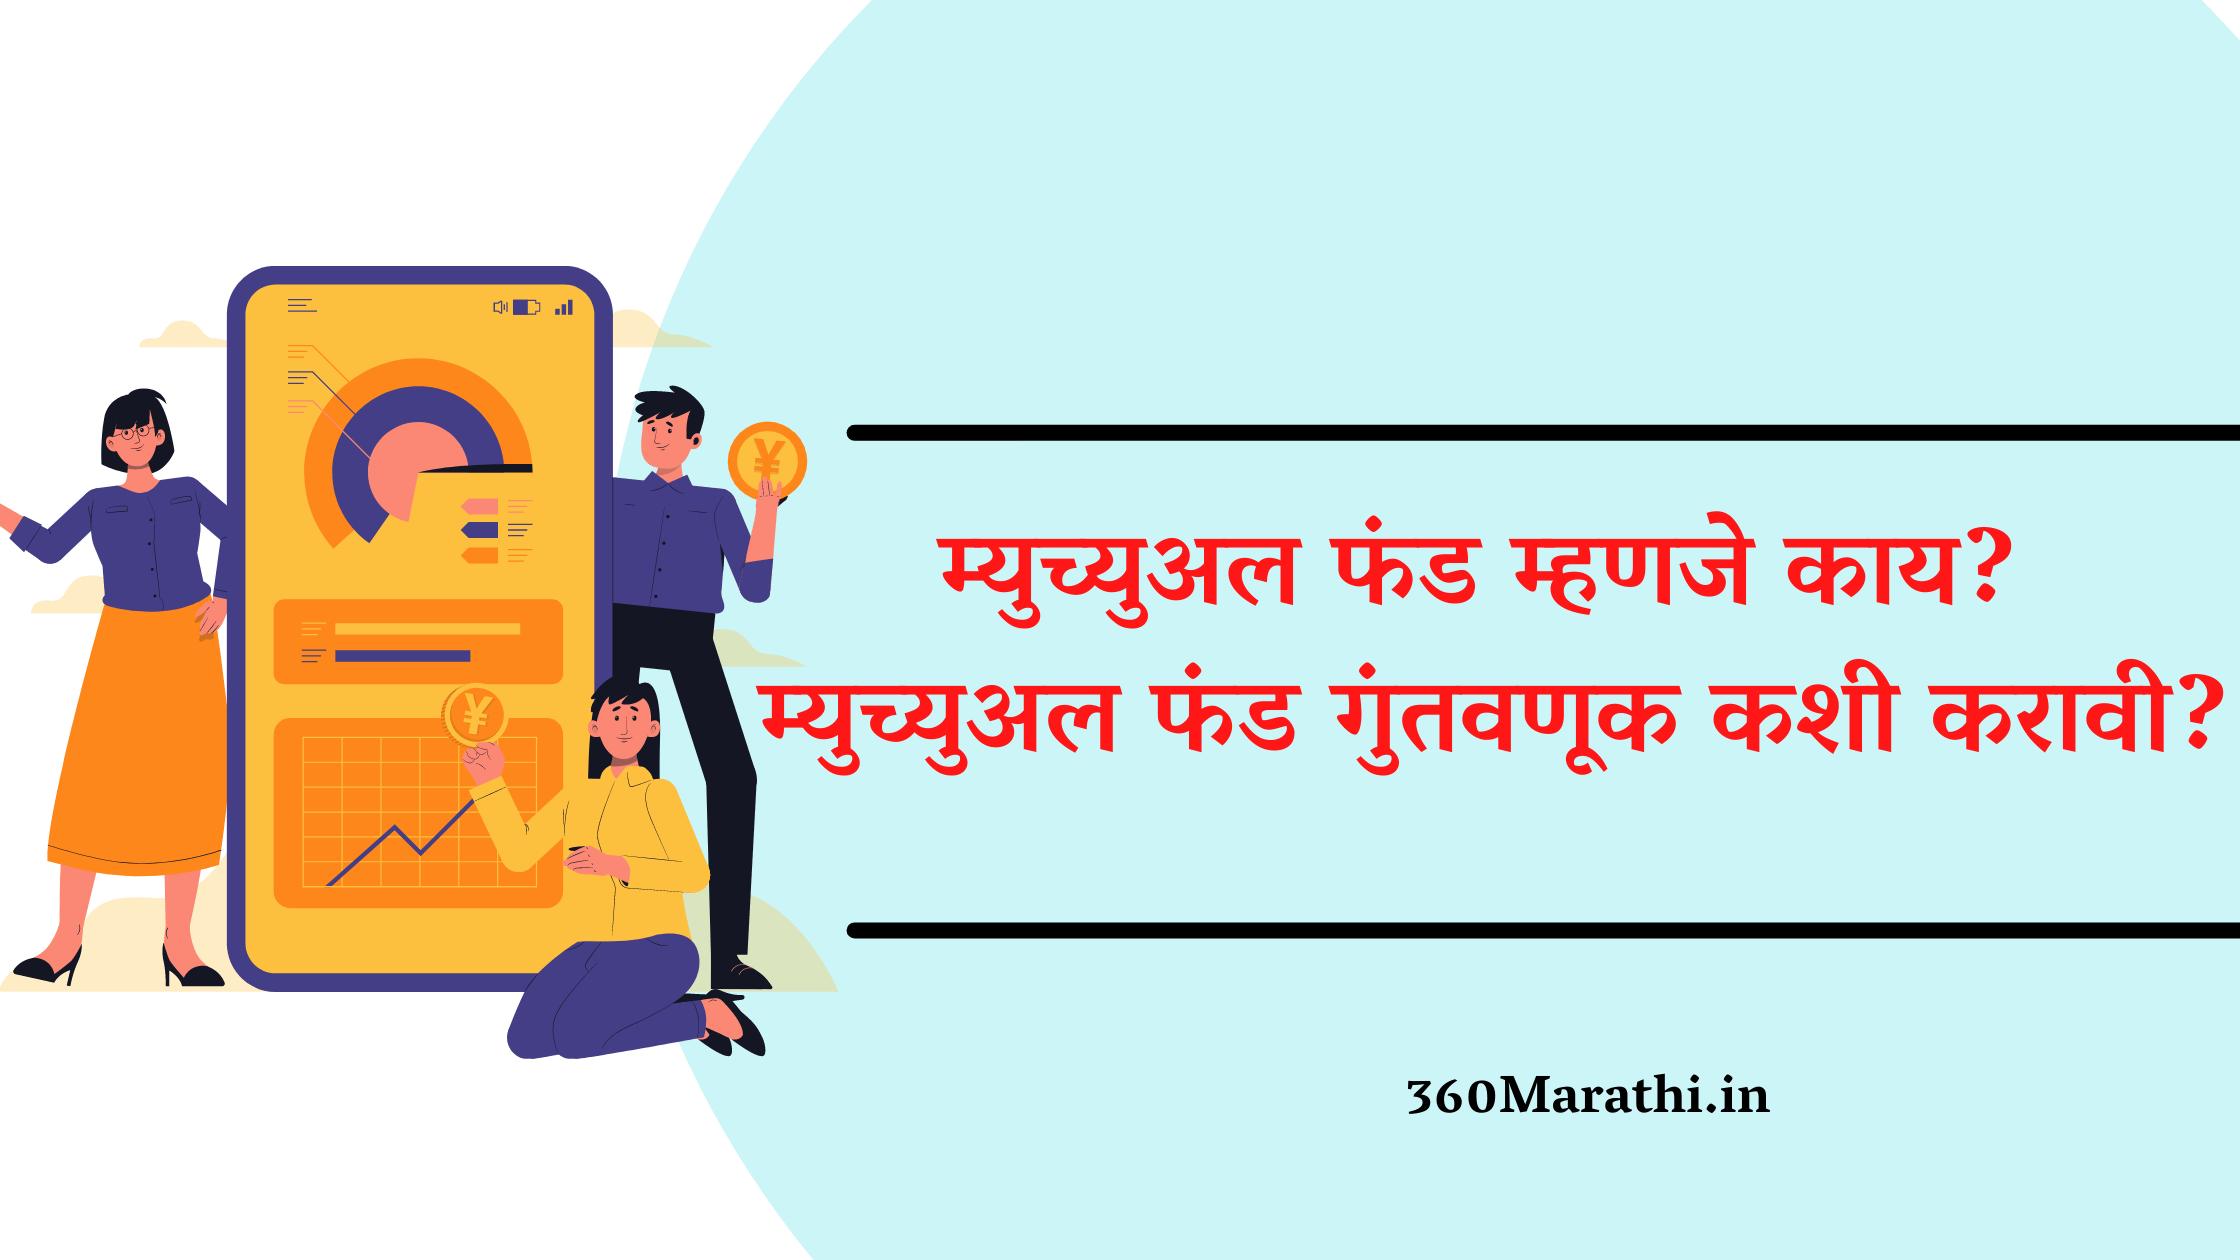 (सुरक्षित गुंतवणूक) Mutual Fund Investment Information In Marathi   Mutual Funds In Marathi